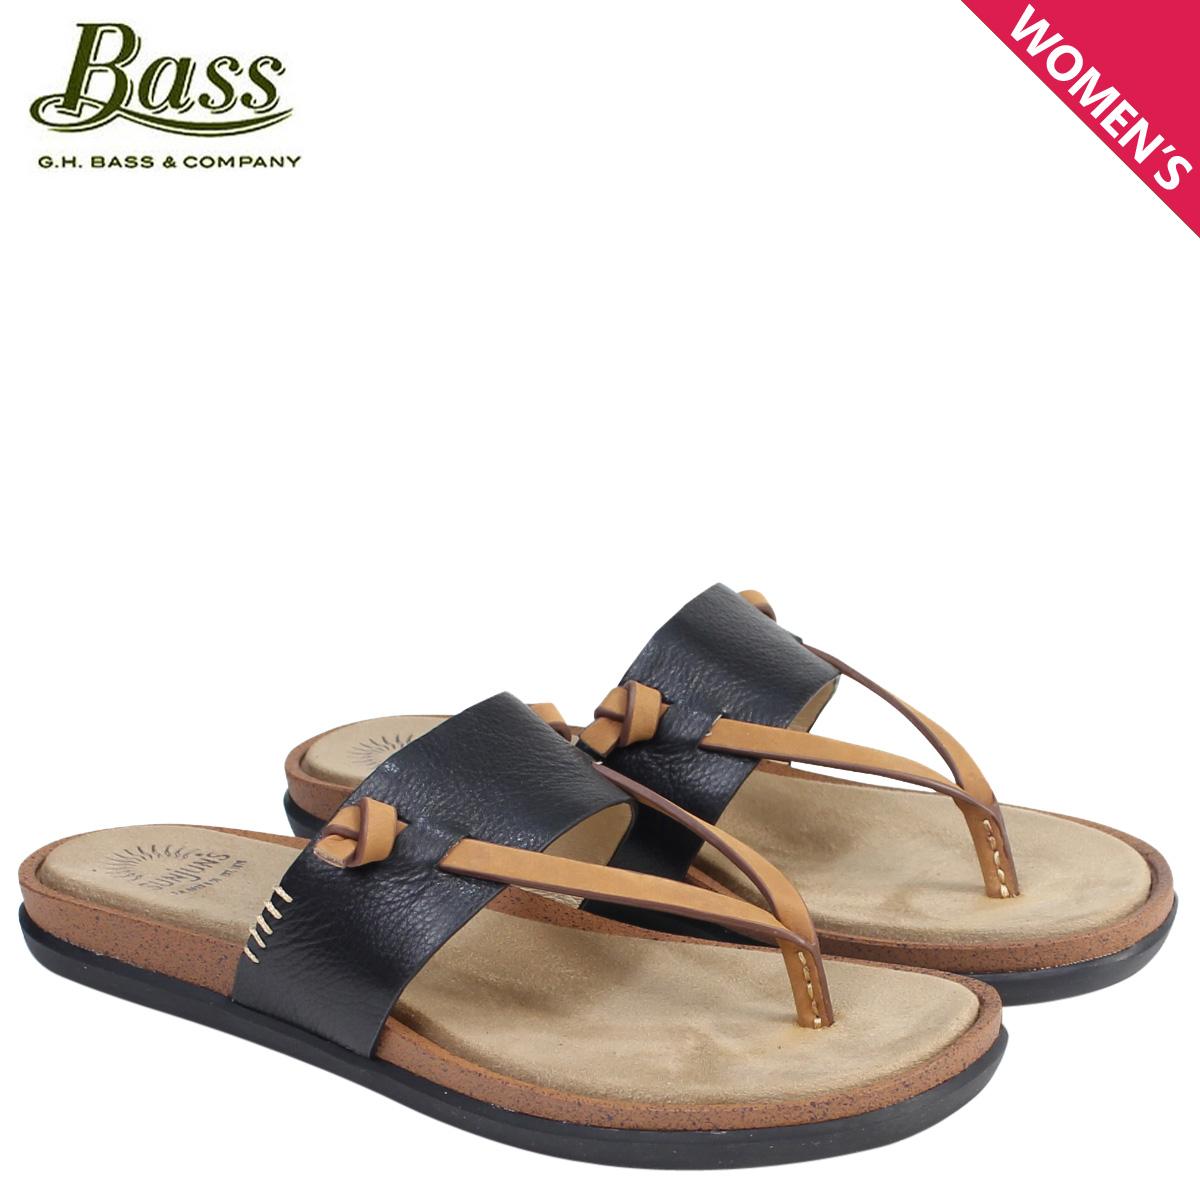 4213a0cdbec G.H. BASS sandals lady s G H bus tong sandals SHANNON THONG SUNJUNS  71-23